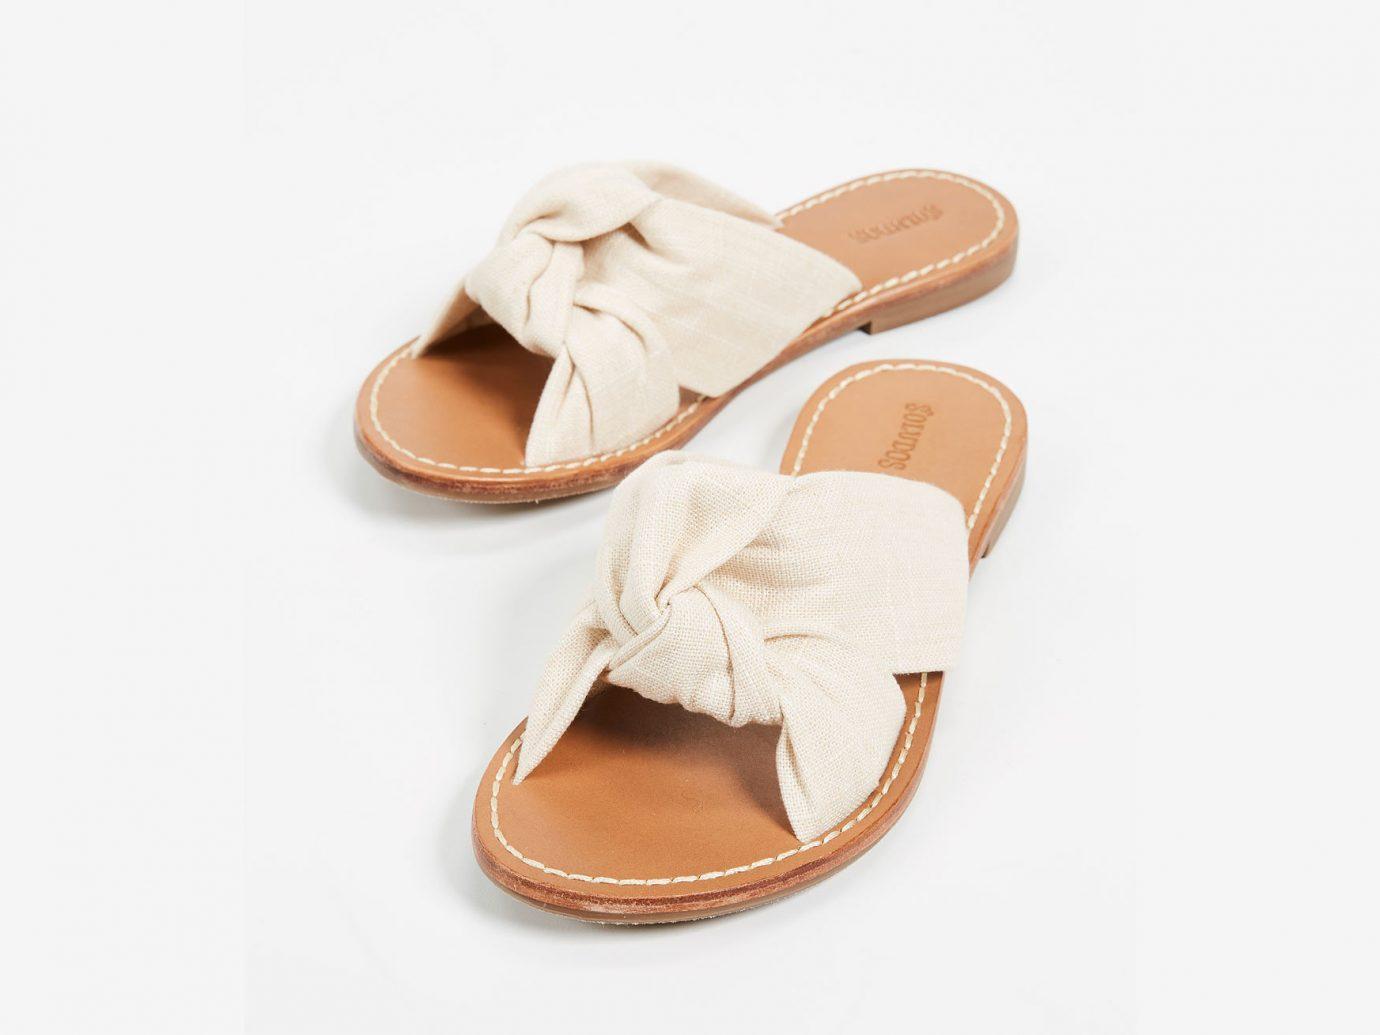 Morocco Packing Tips Style + Design Travel Shop footwear sandal shoe flip flops beige product peach outdoor shoe product design